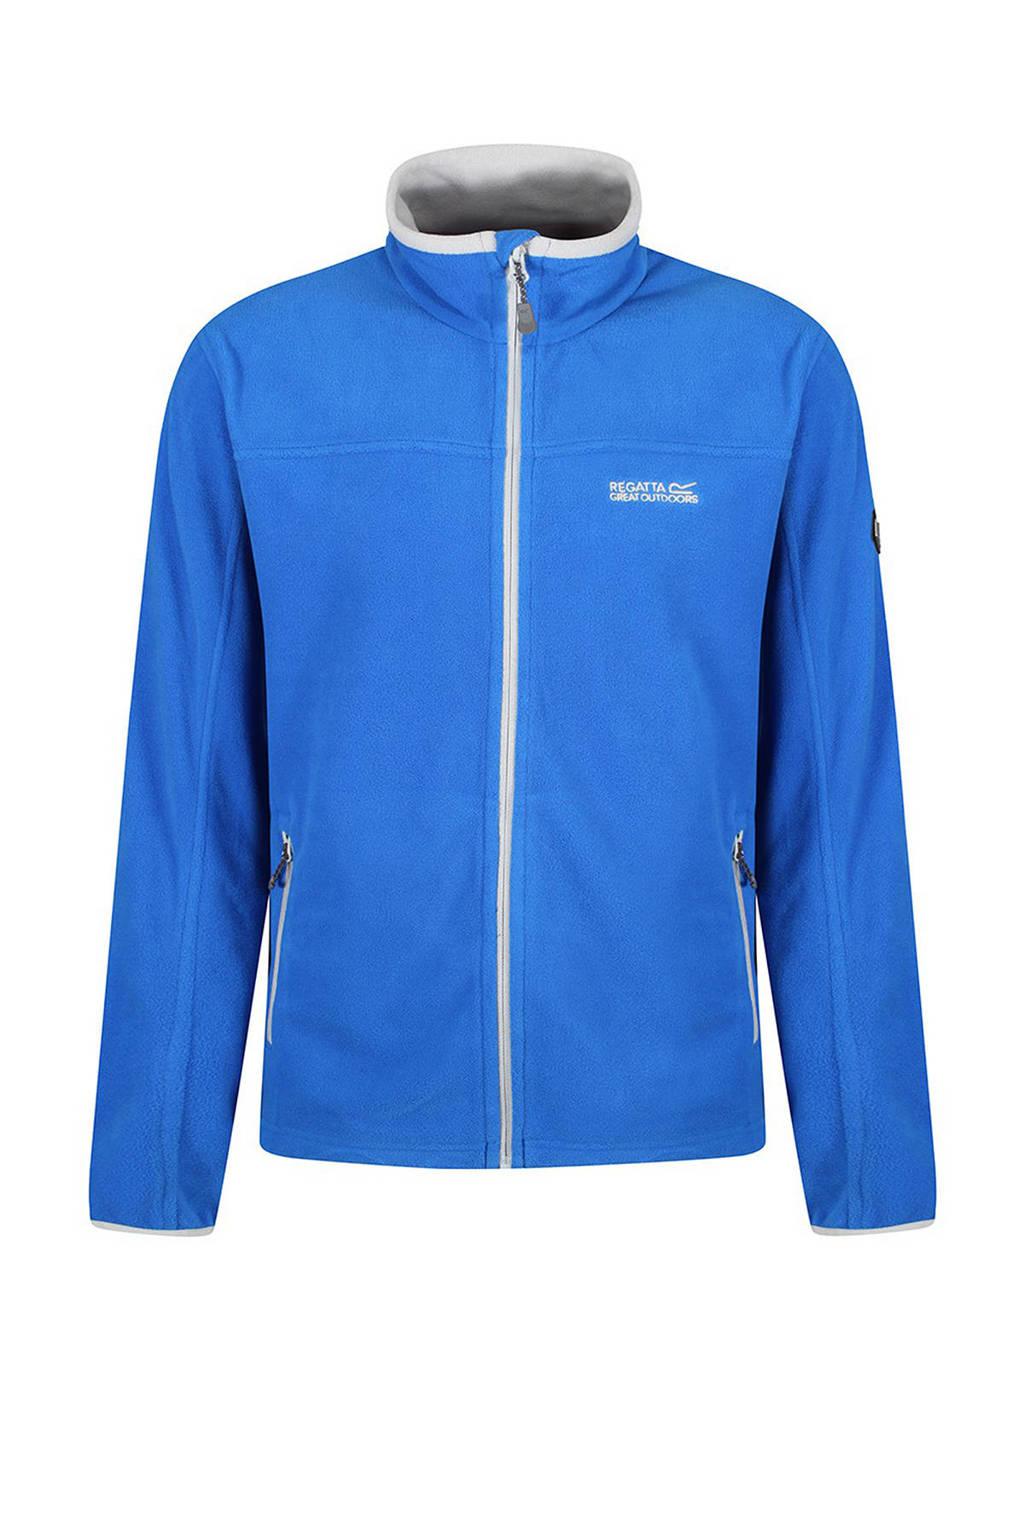 Regatta fleece jack Stanton II blauw, Oxford Blue/Light Steel